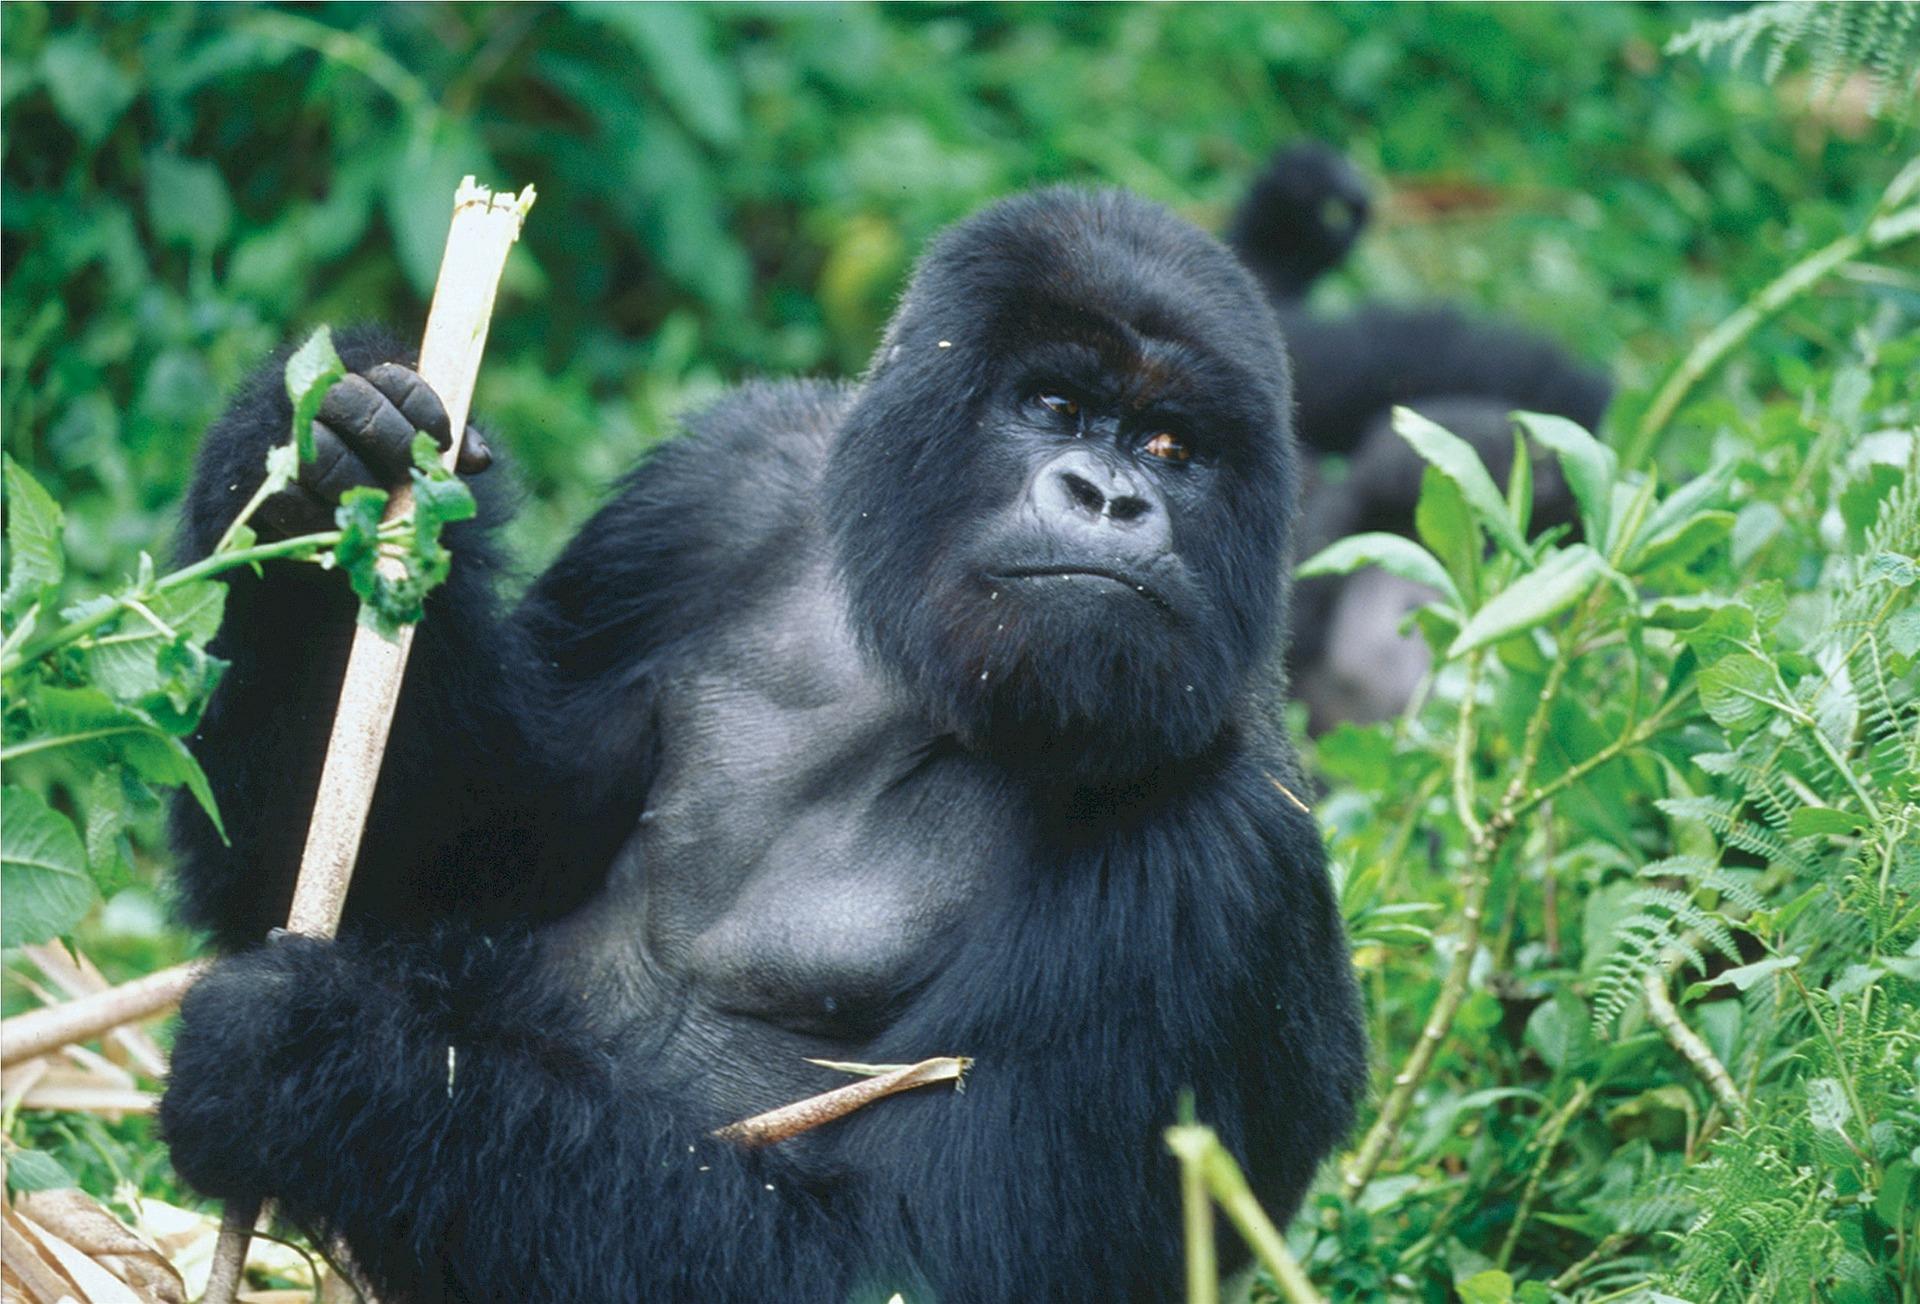 If you head on a gorilla trek in Rwanda, you'll come across the beautiful silverback.